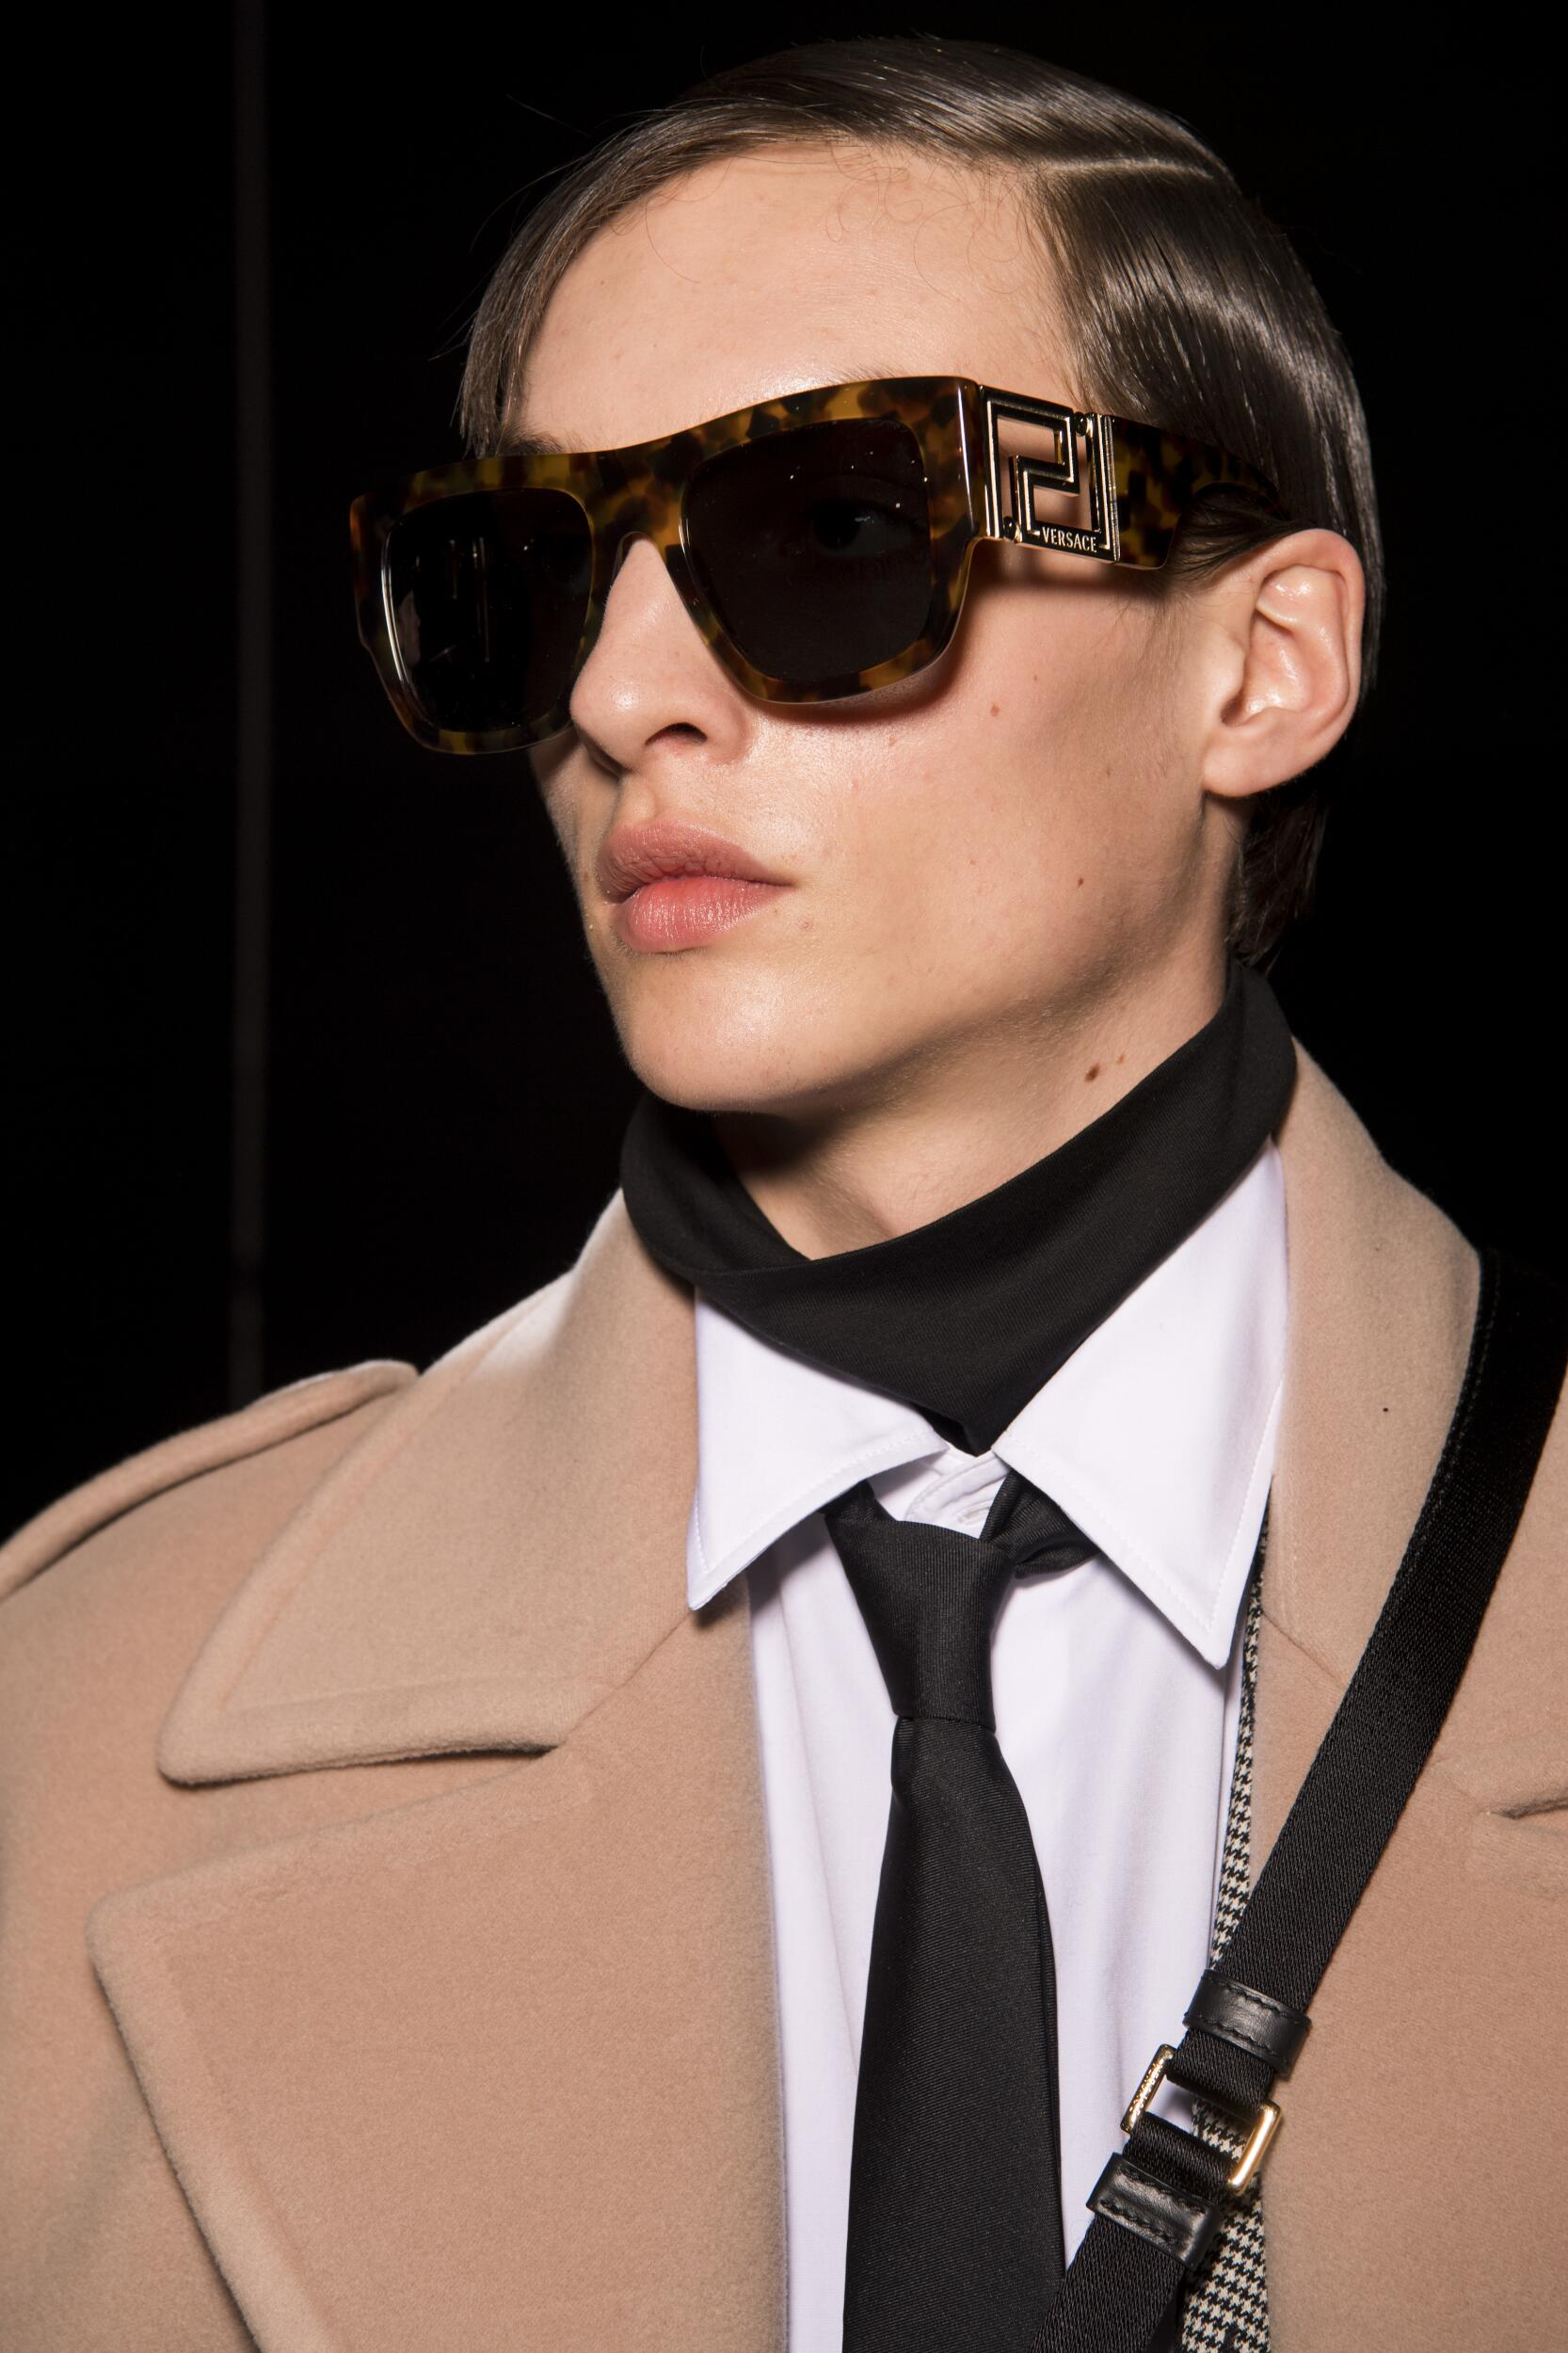 Backstage Versace Model Trends 2020